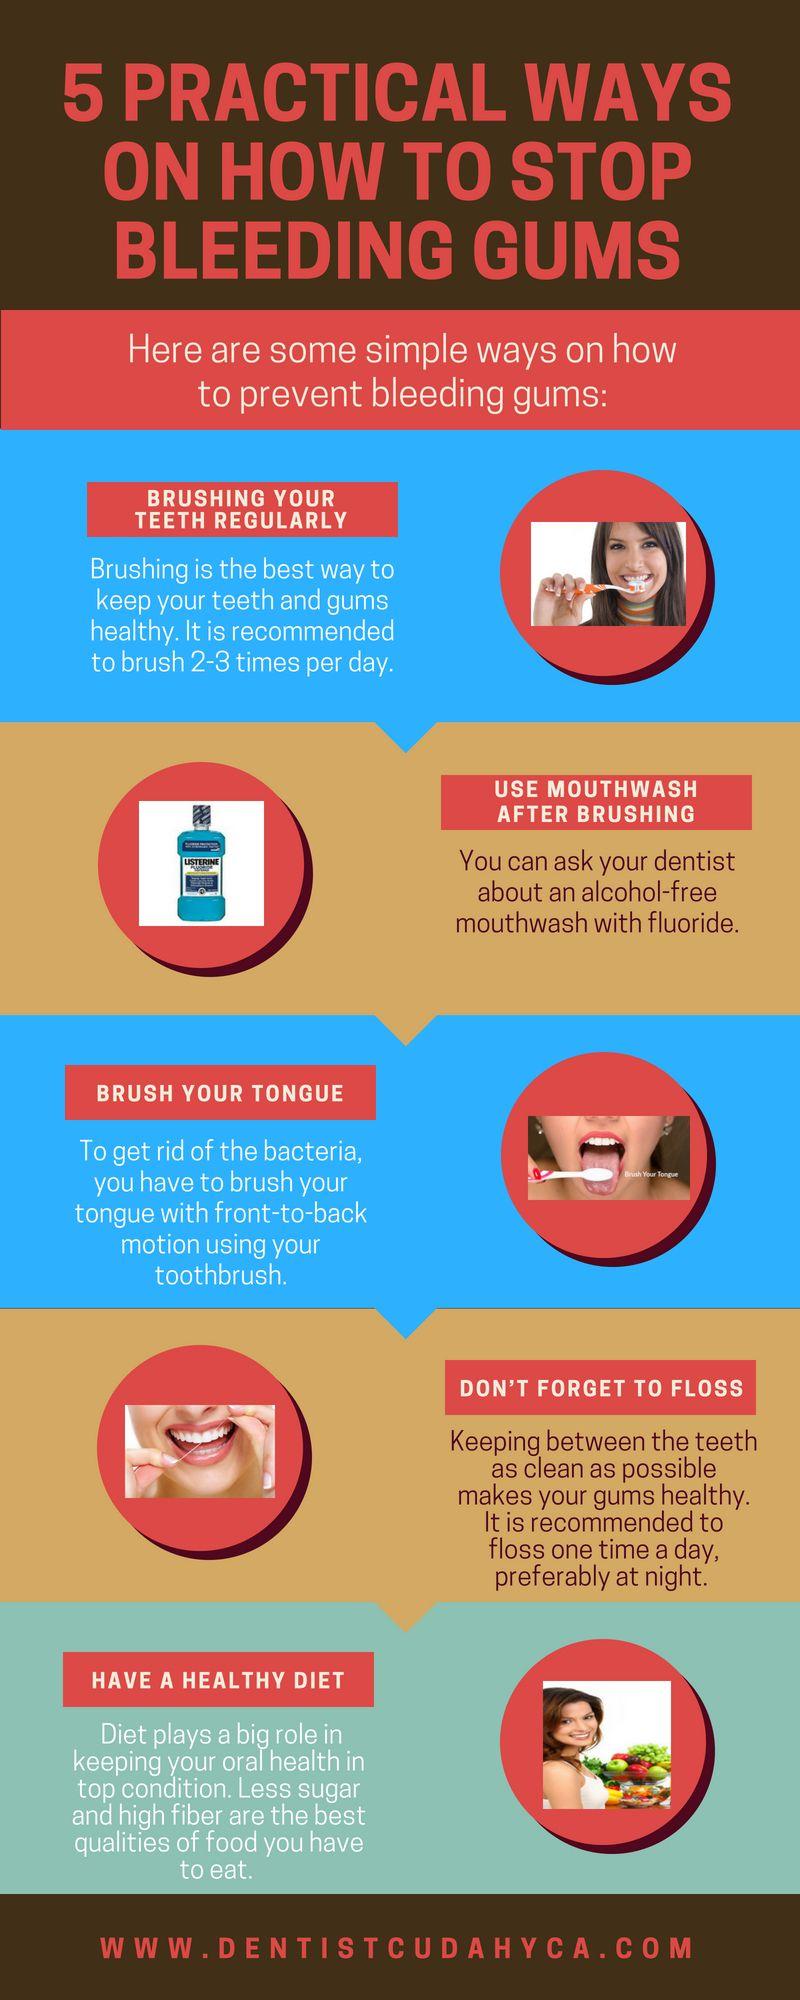 5 Practical Ways On How To Stop Bleeding Gums Bleeding